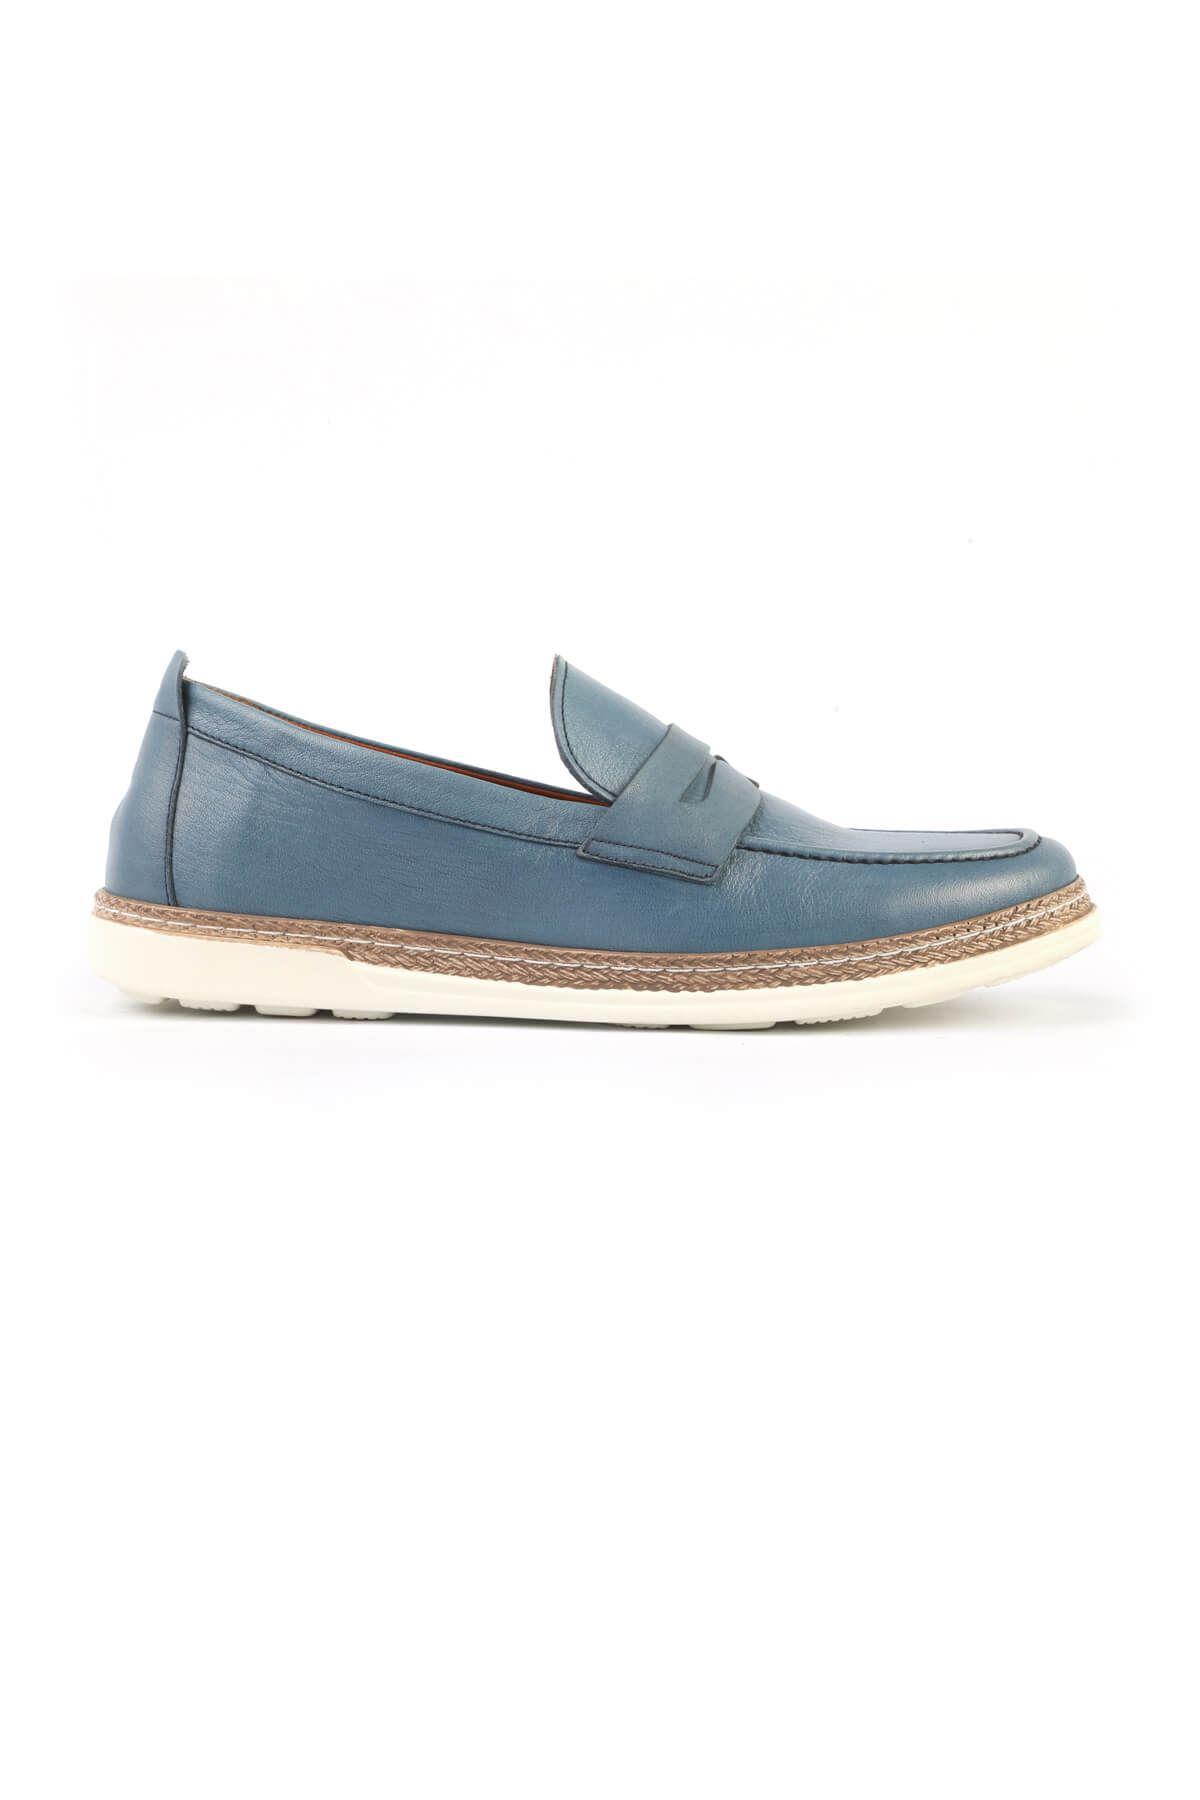 Libero C825 Blue Loafer Shoes